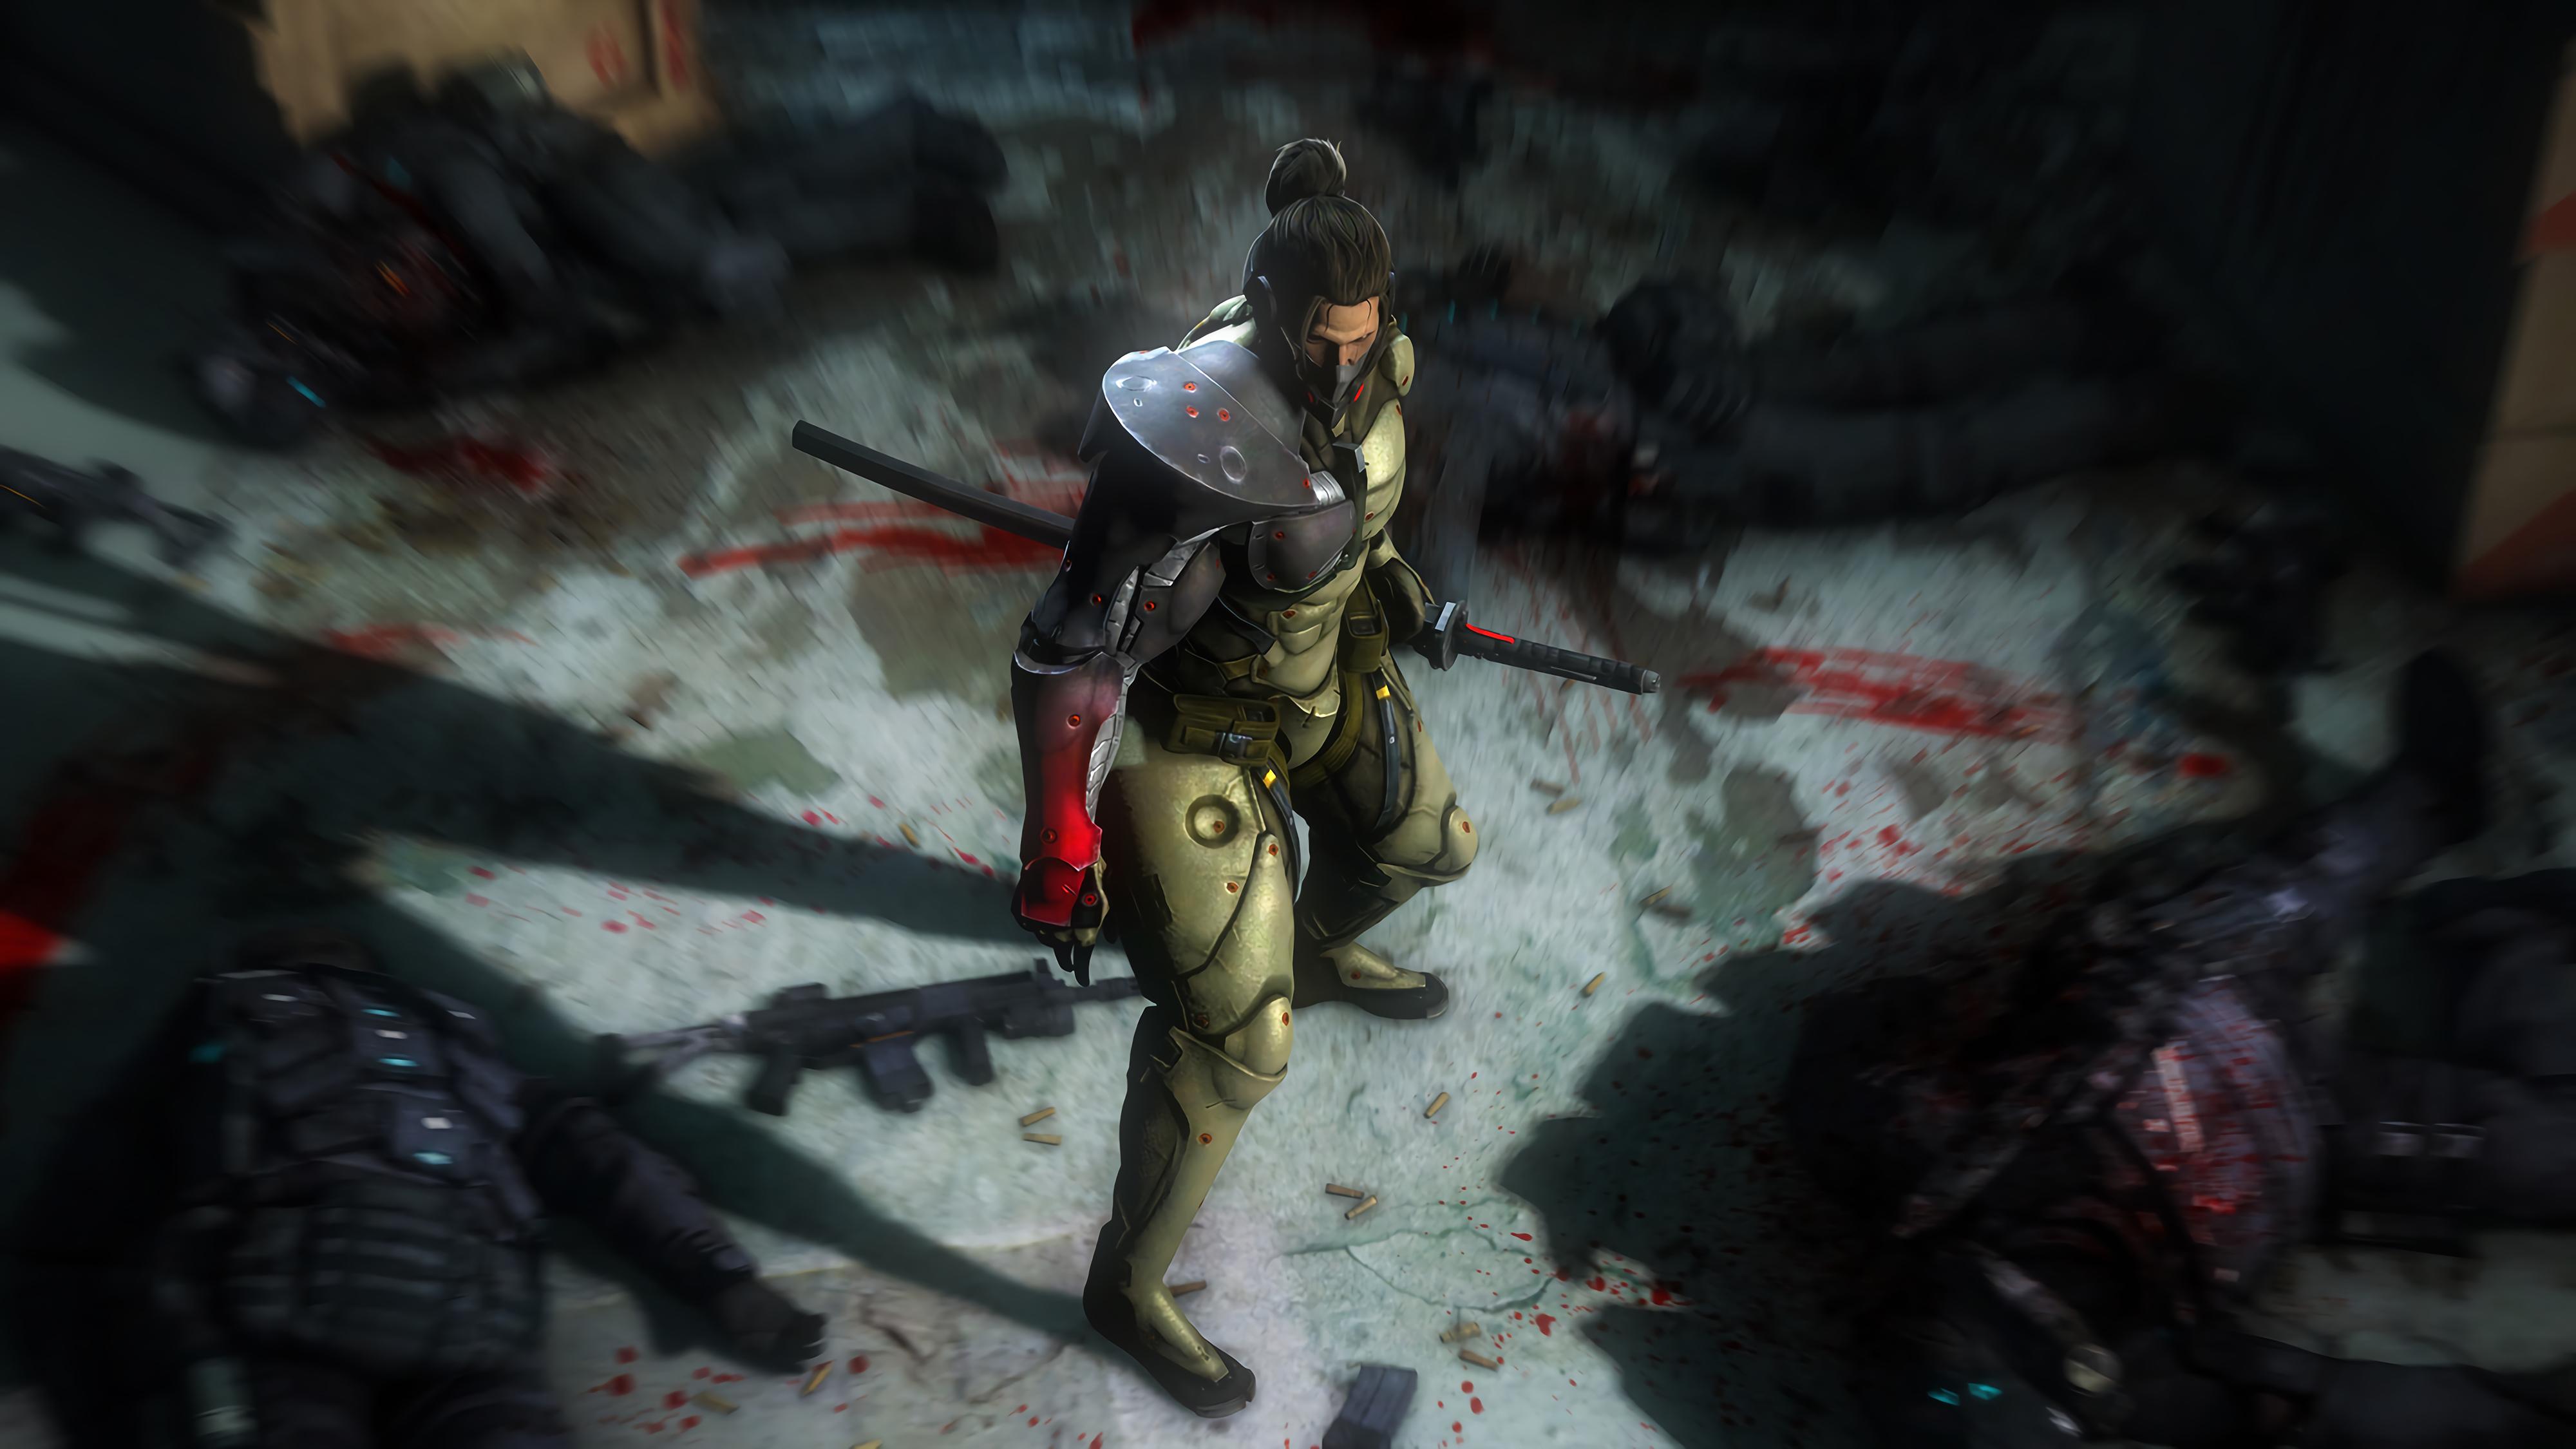 Jetstream Sam From Metal Gear Rising Hd Artist 4k Wallpapers